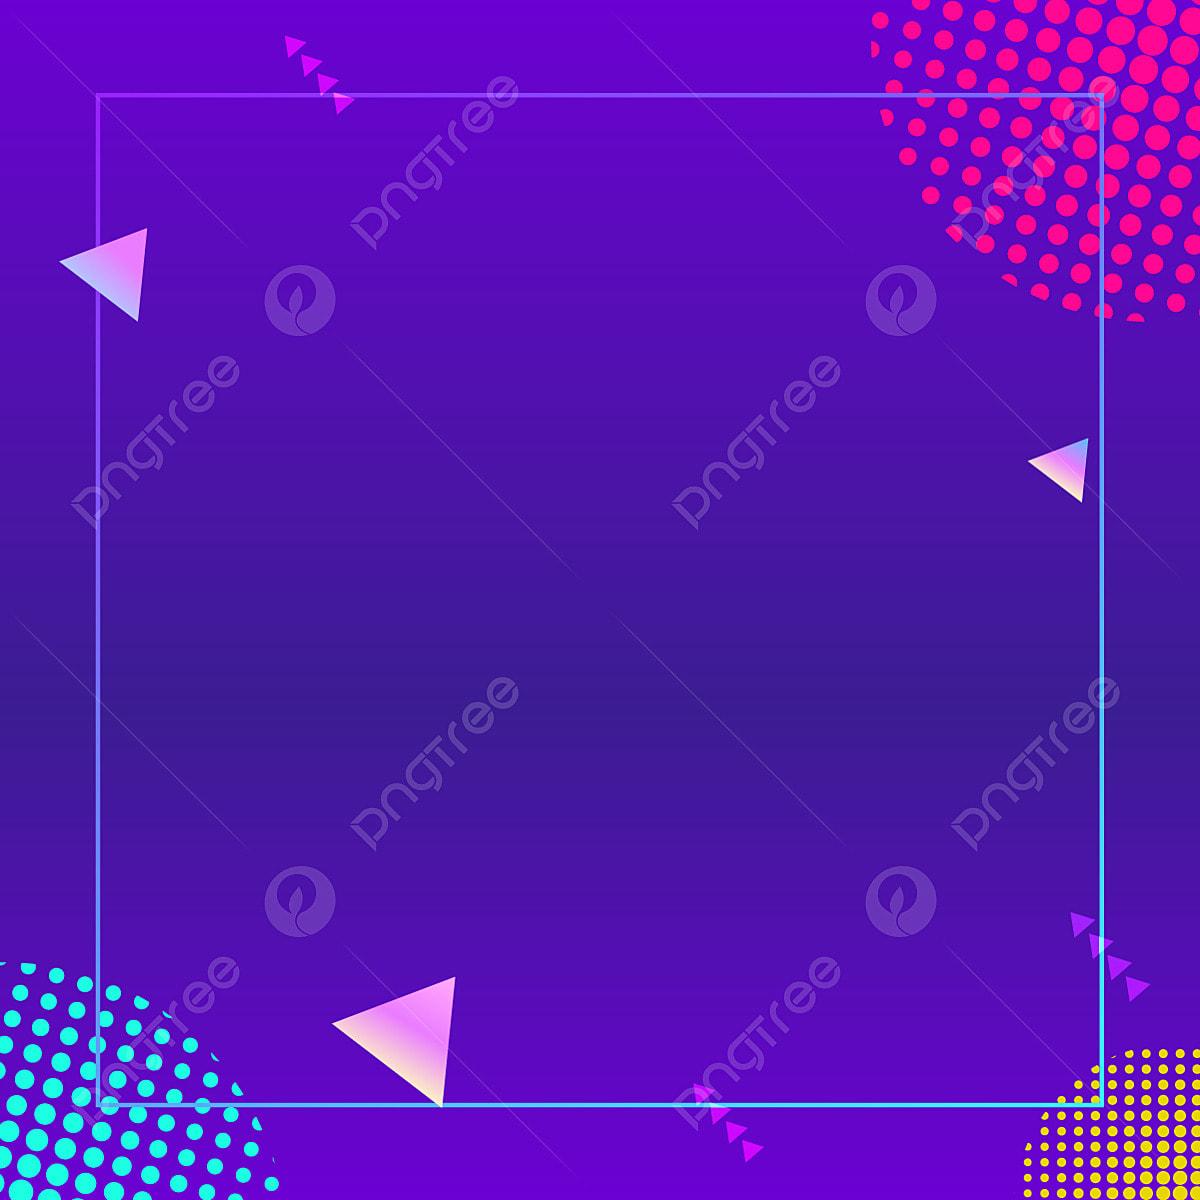 Blue Simple Square Background Illustration, Simple, Blue